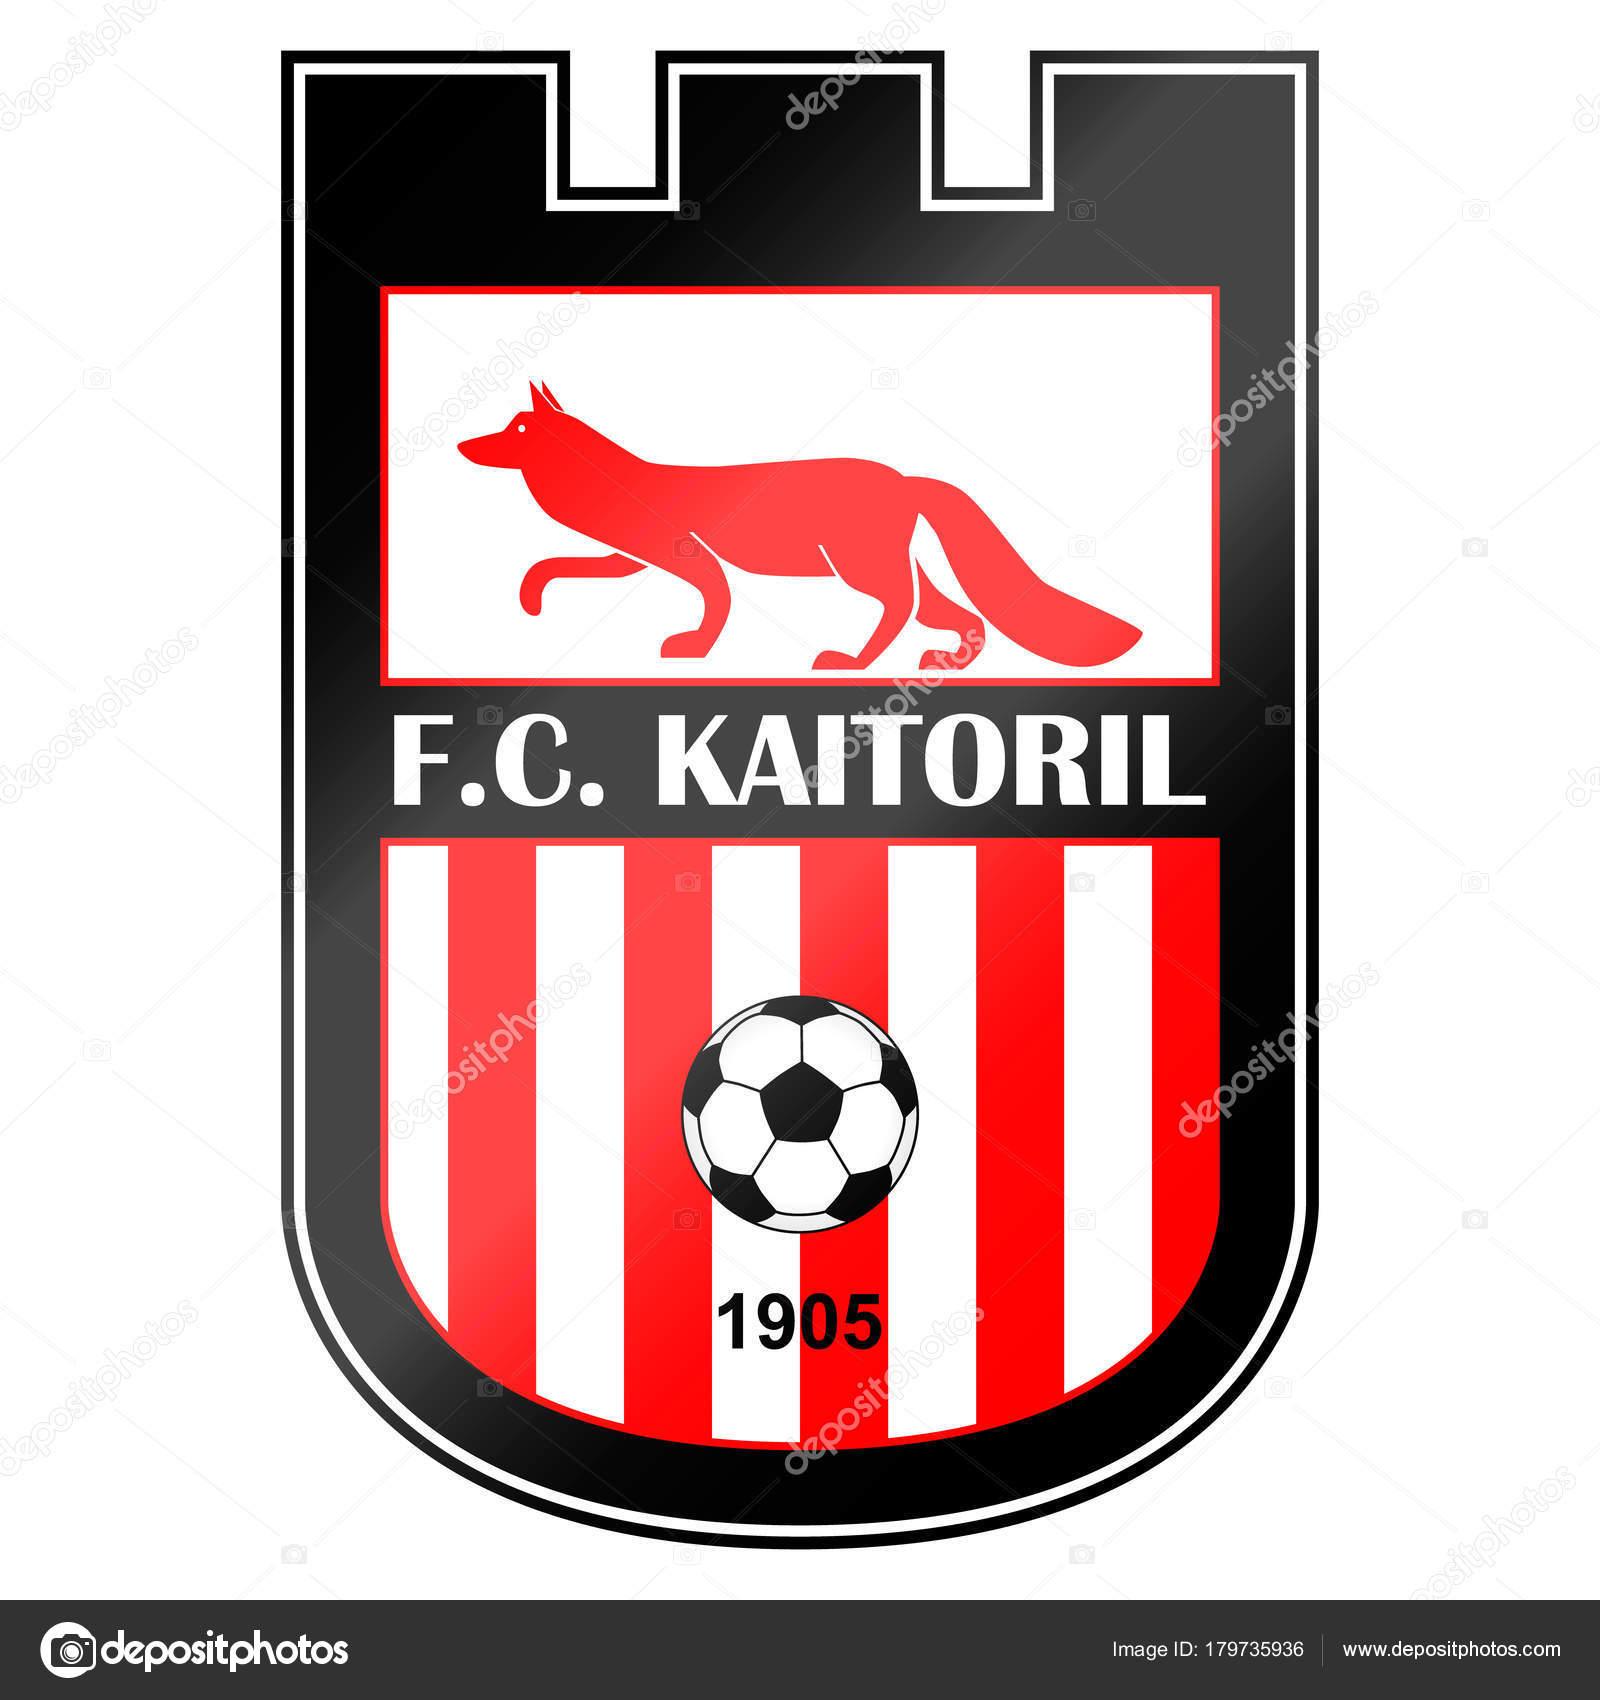 Fussball Team Logo Handelt Sich Fiktive Namen Hier Kann Ein